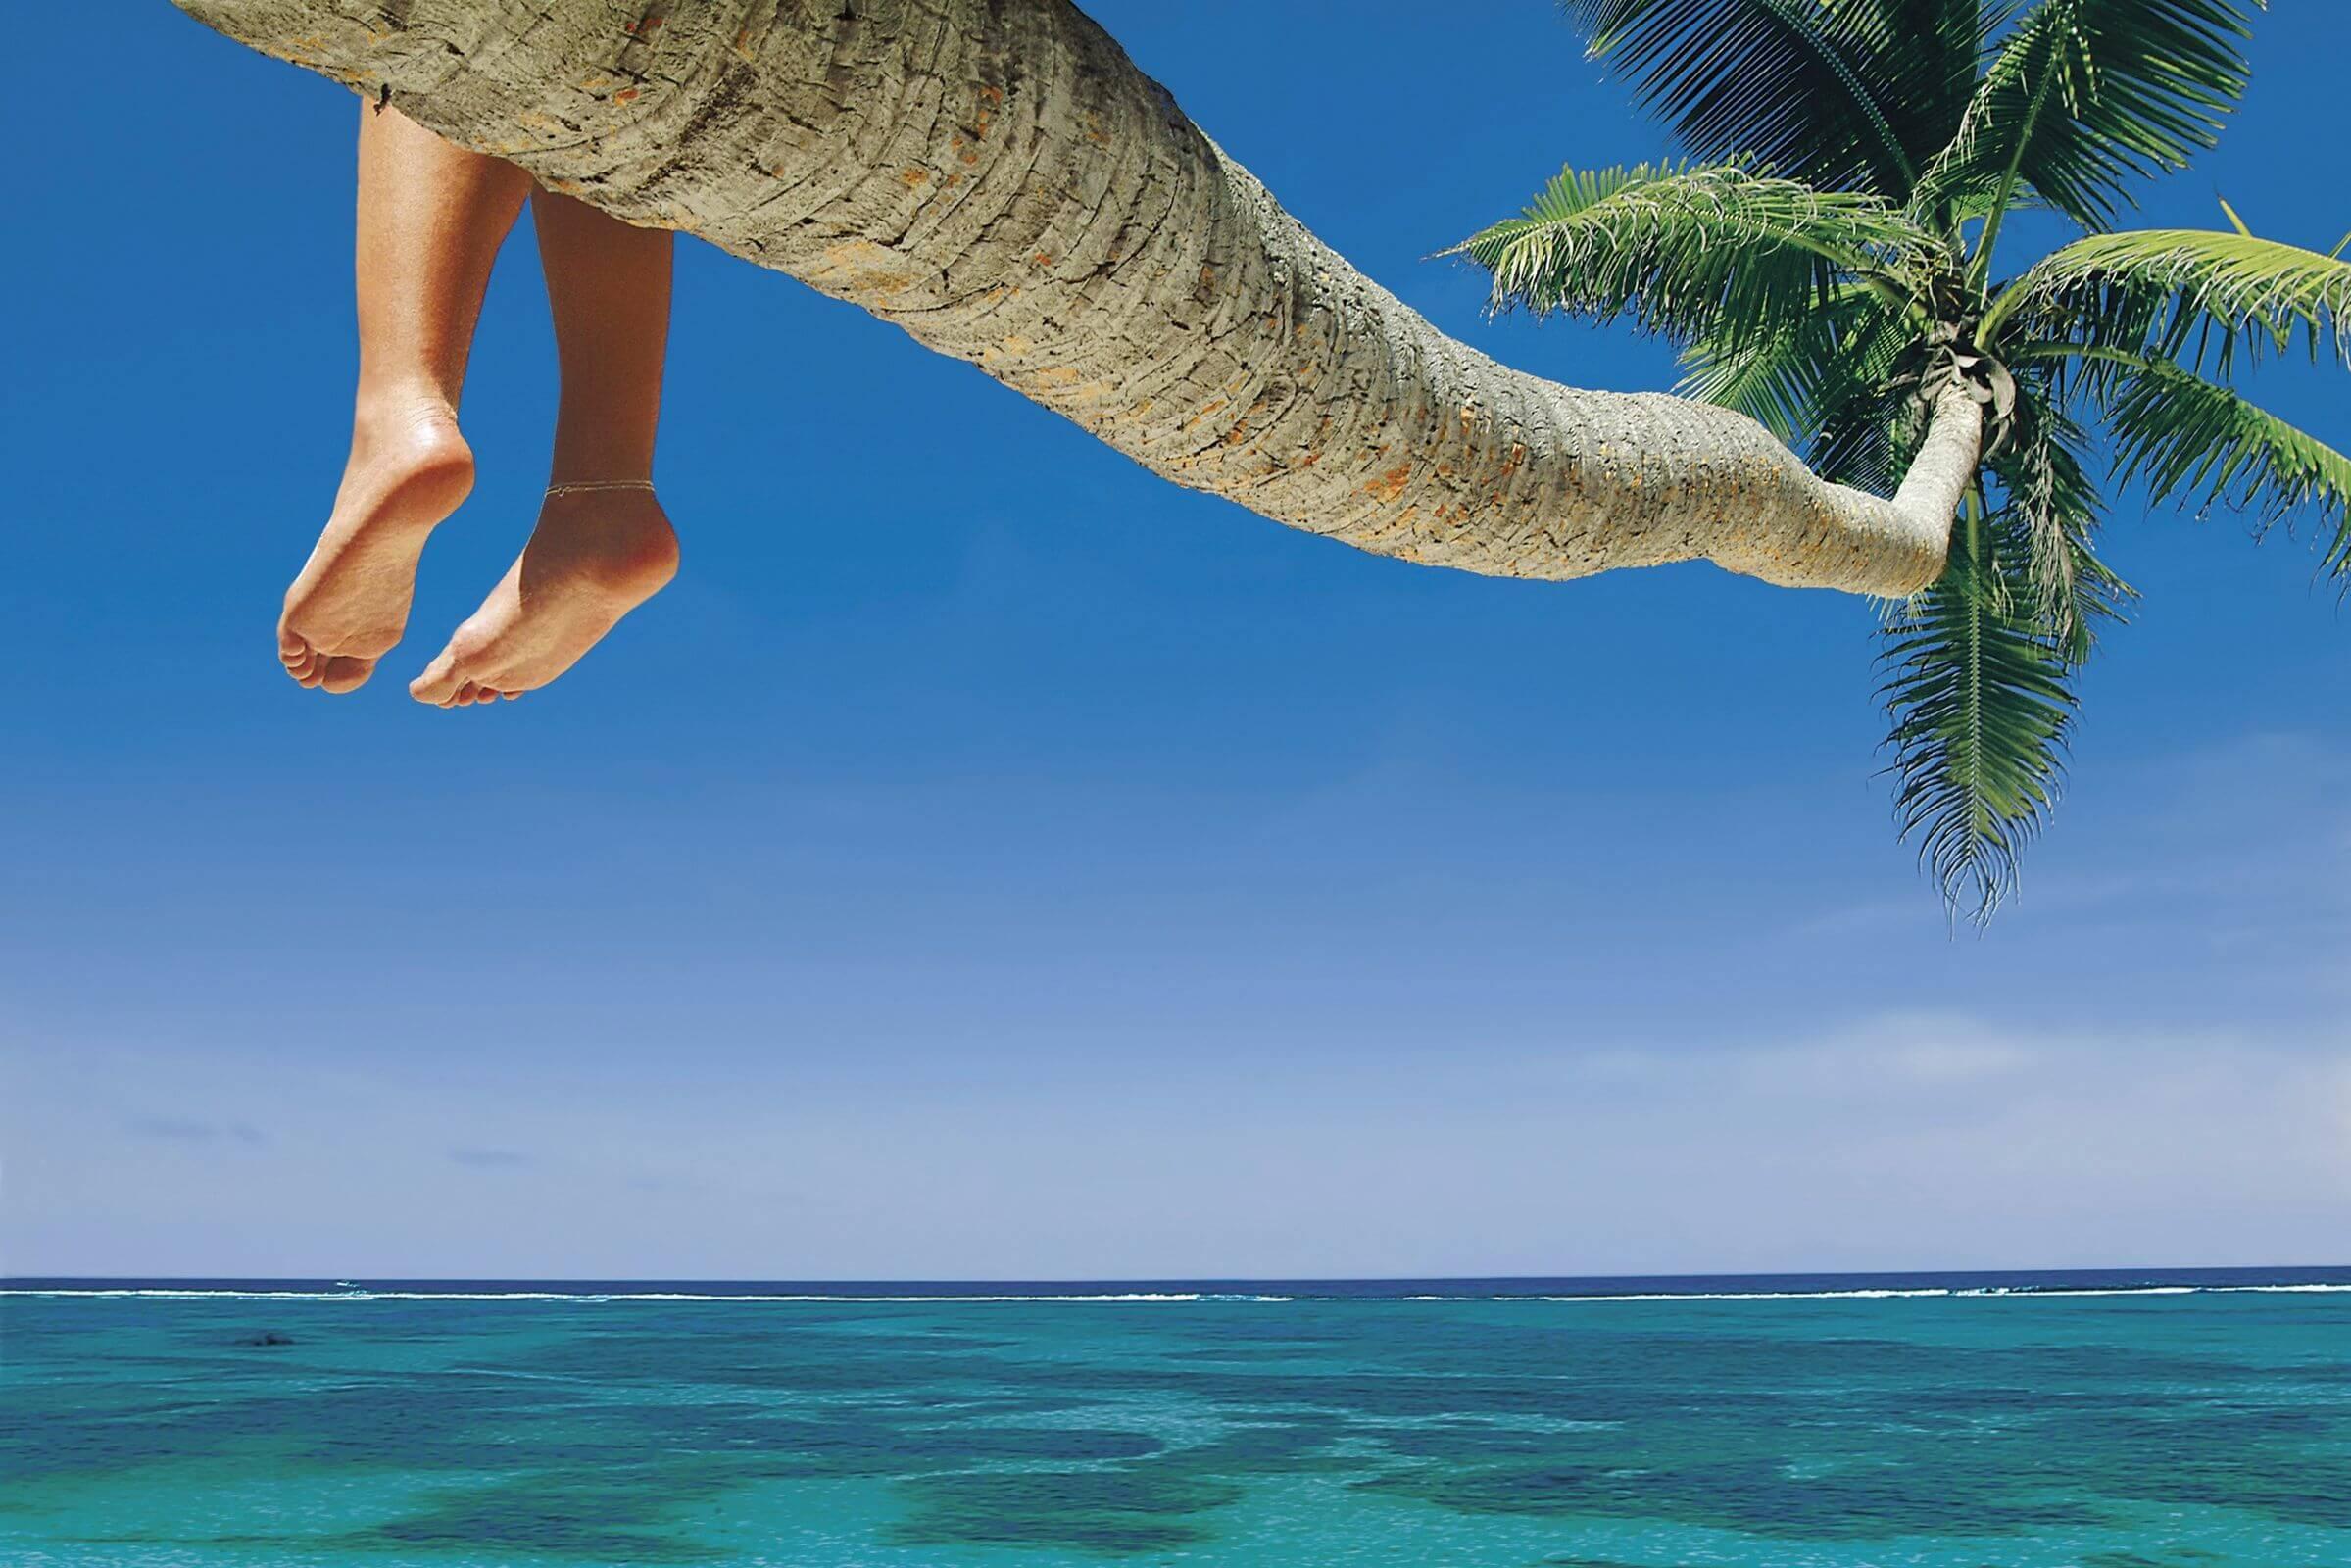 Feet Palm Tree Medium